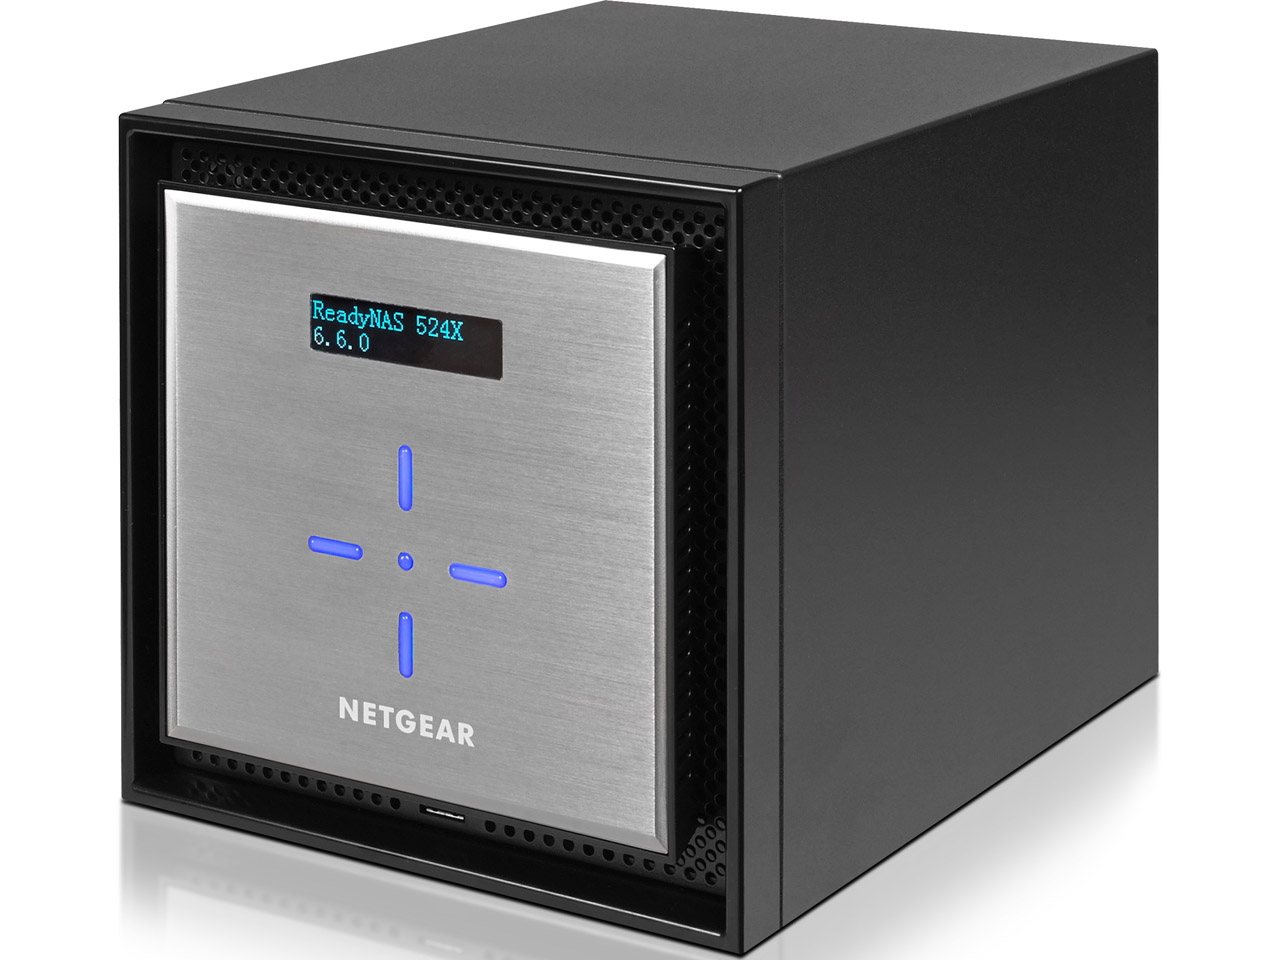 10GBASE-Tを標準装備した「ReadyNAS 524X」